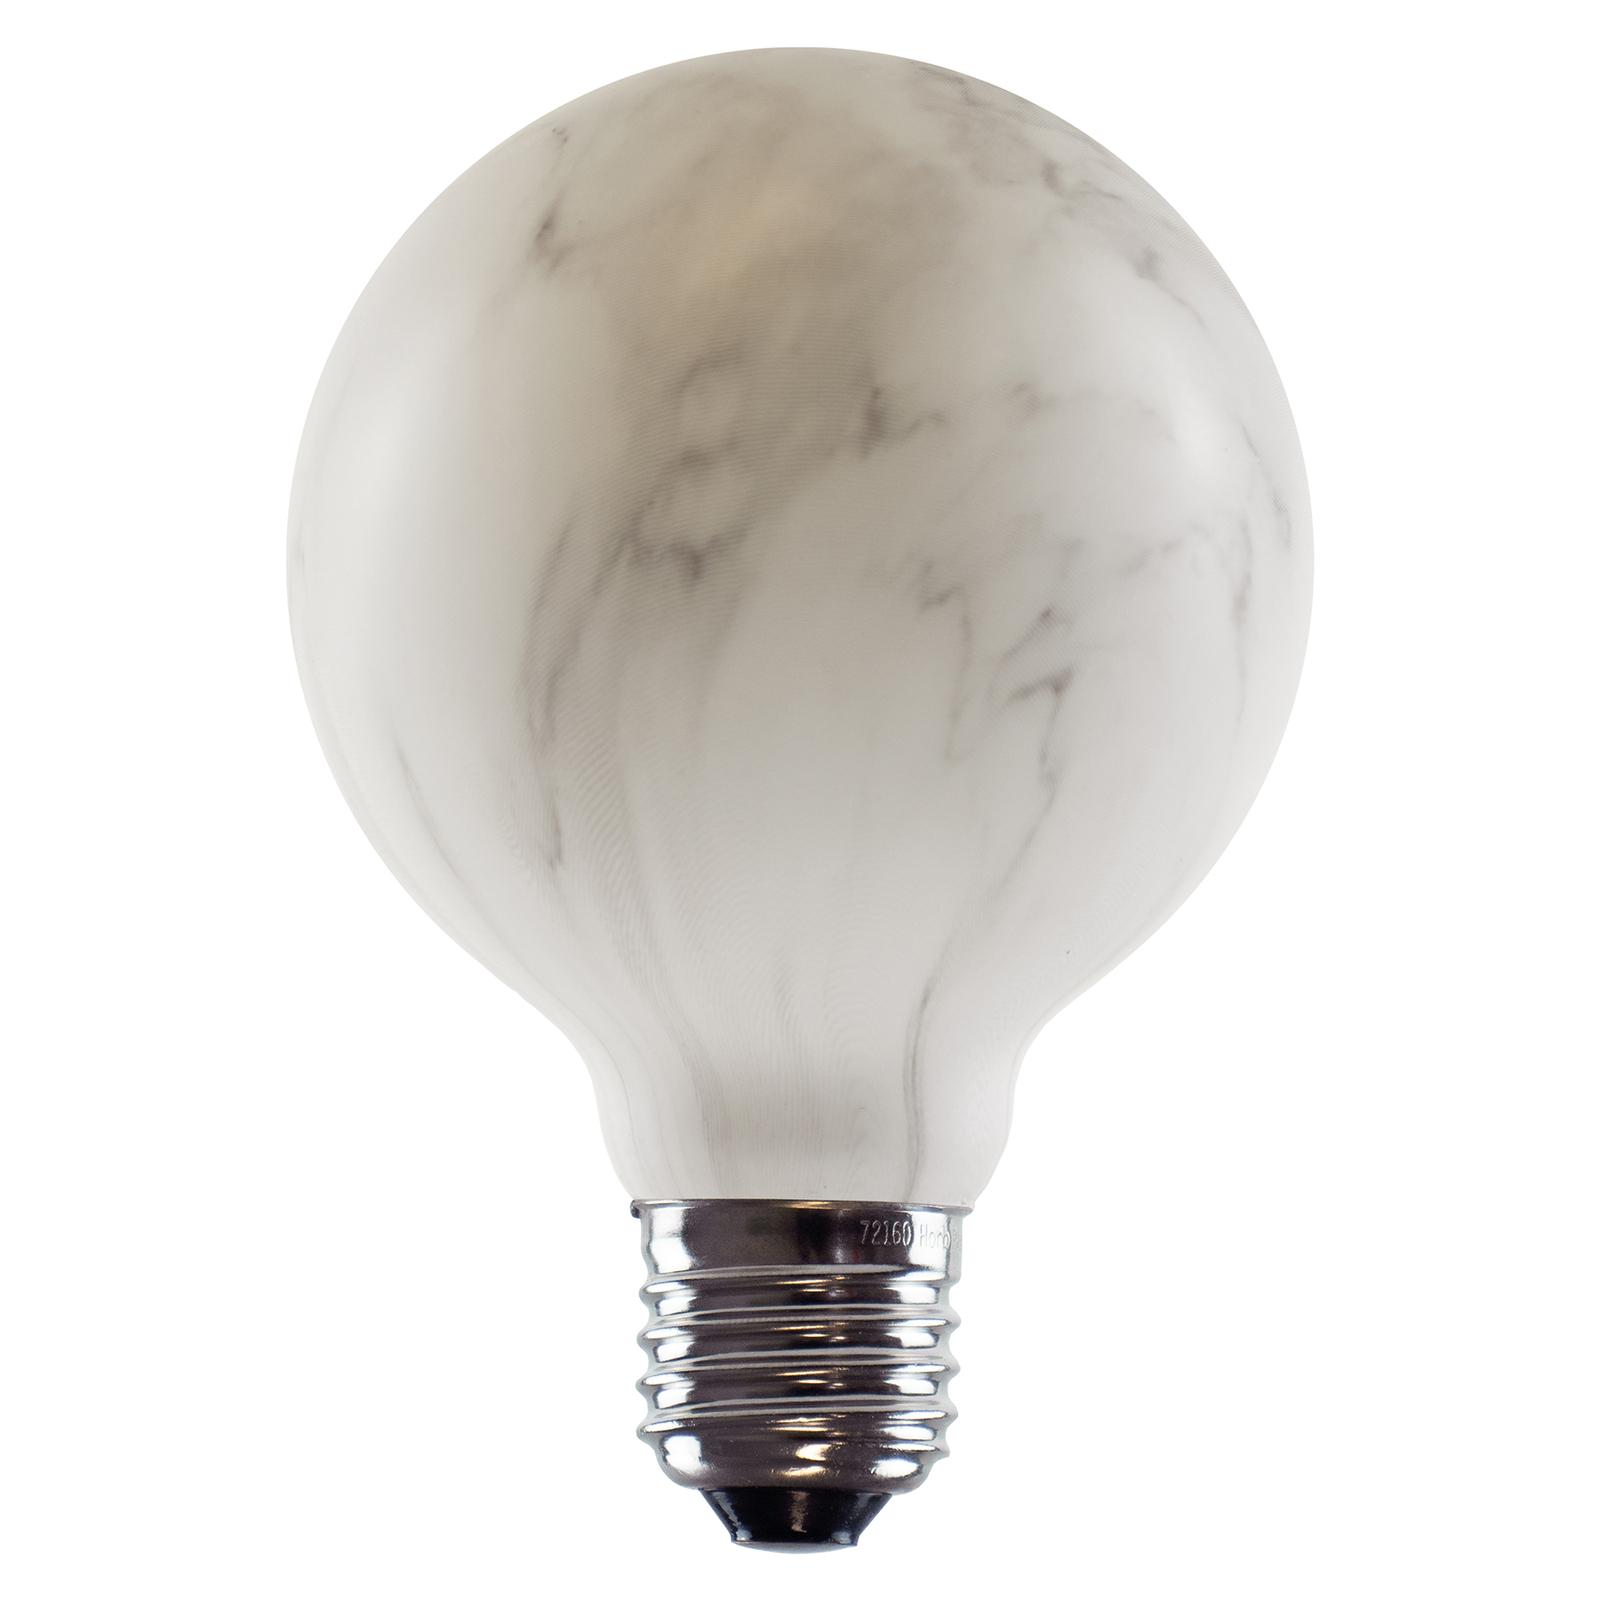 SEGULA LED-globe-lamppu G80 E27 8W marmorijäl